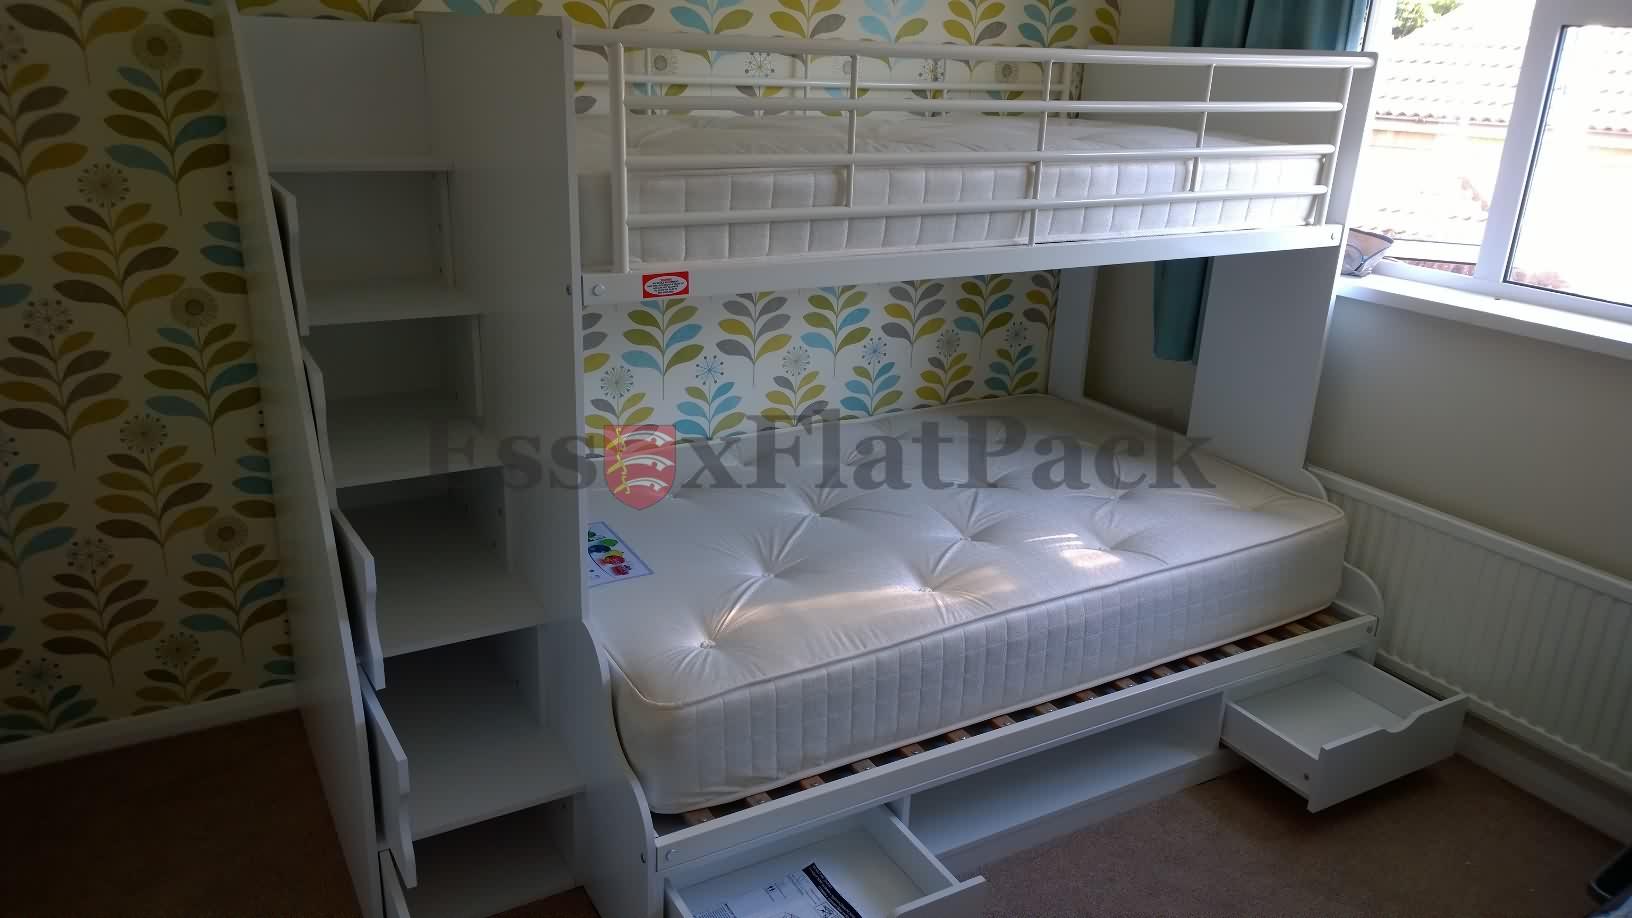 essexflatpack-cabin-bunks-20150906100708.jpg